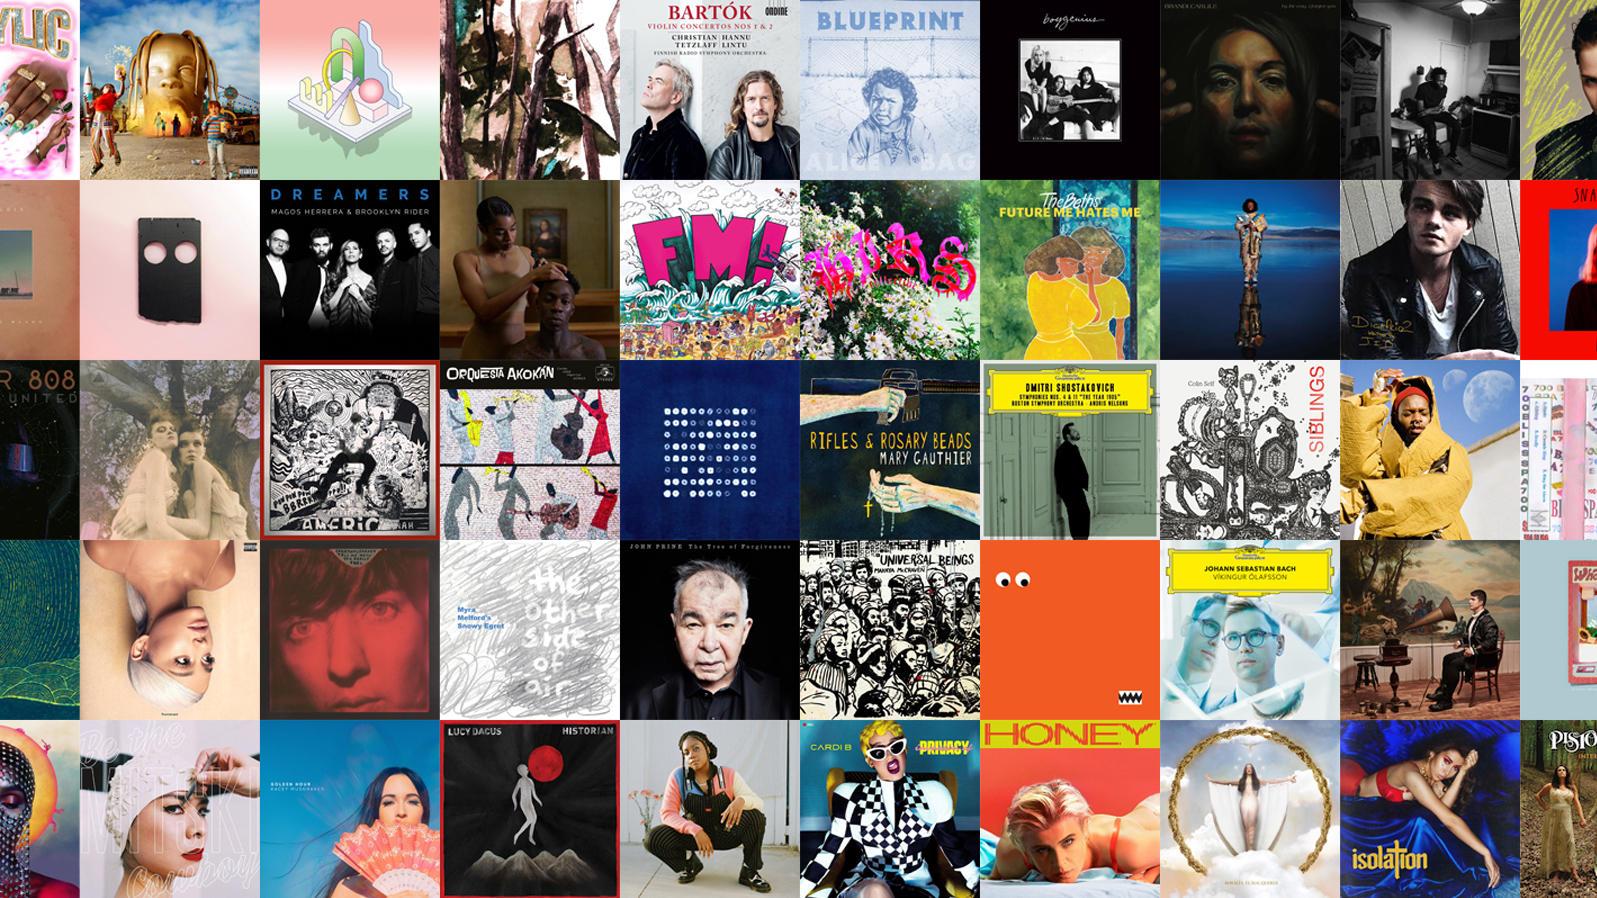 Npr 50 Best Albums 2019 Stream NPR Music's 50 Best Albums Of 2018 | NPR Illinois